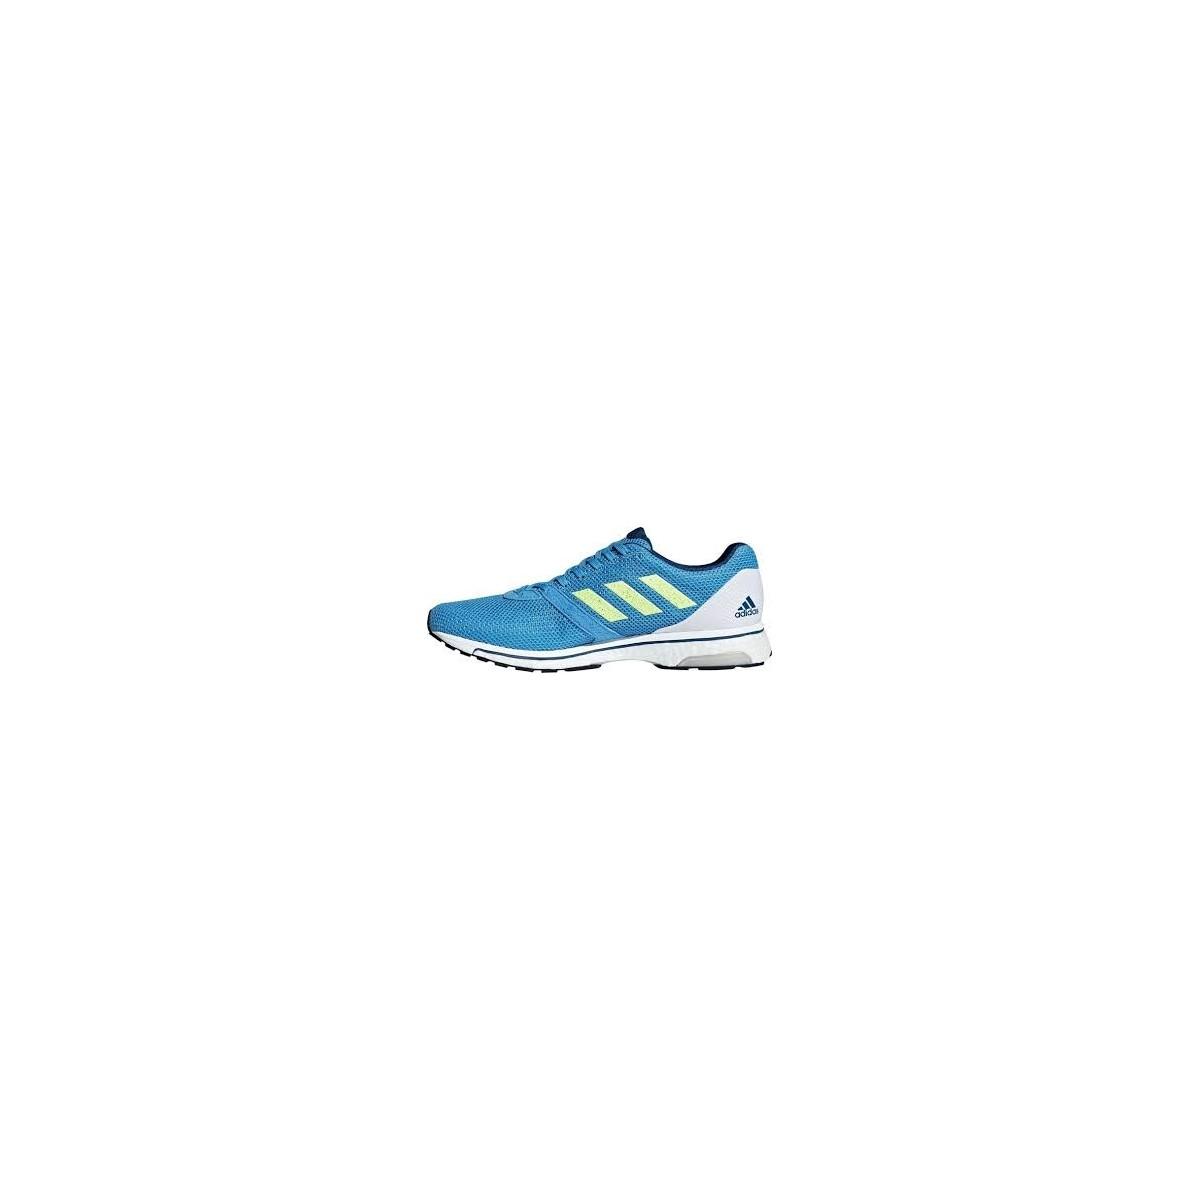 Zapatillas Adidas Adizero Adios 4 m Azul Blanco Lima PV19